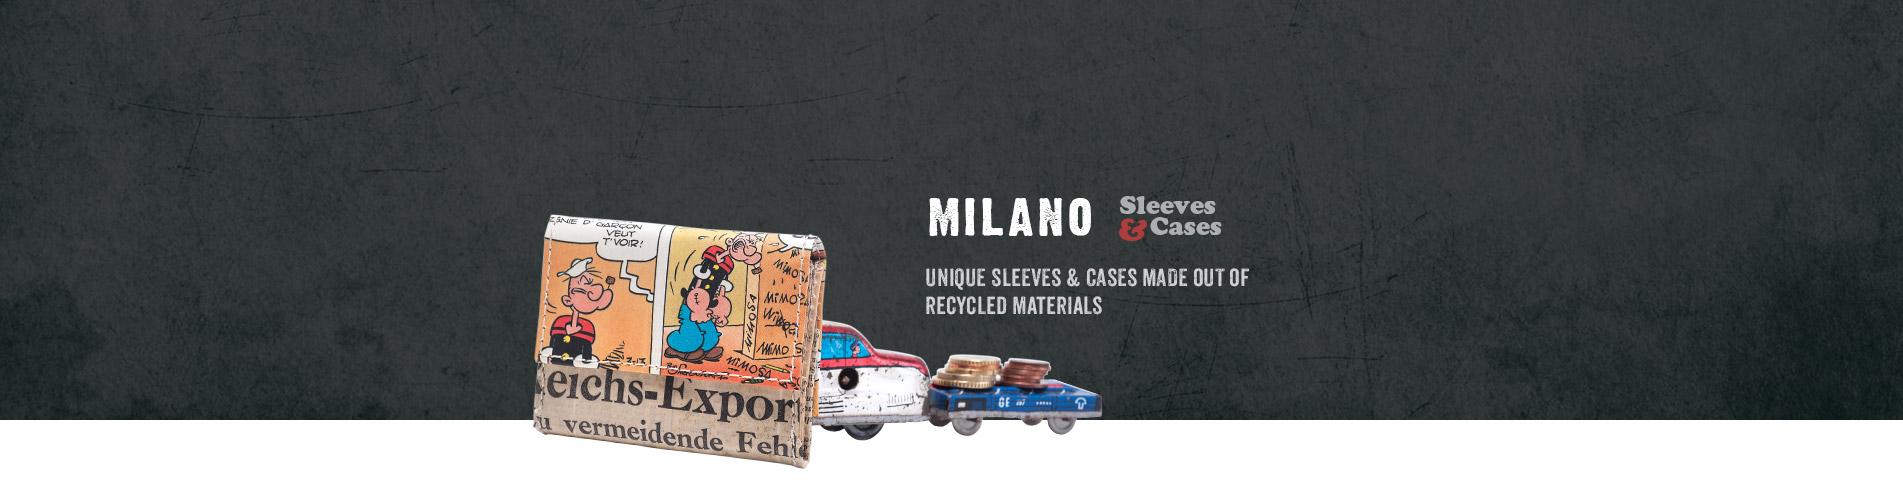 Milano Cases